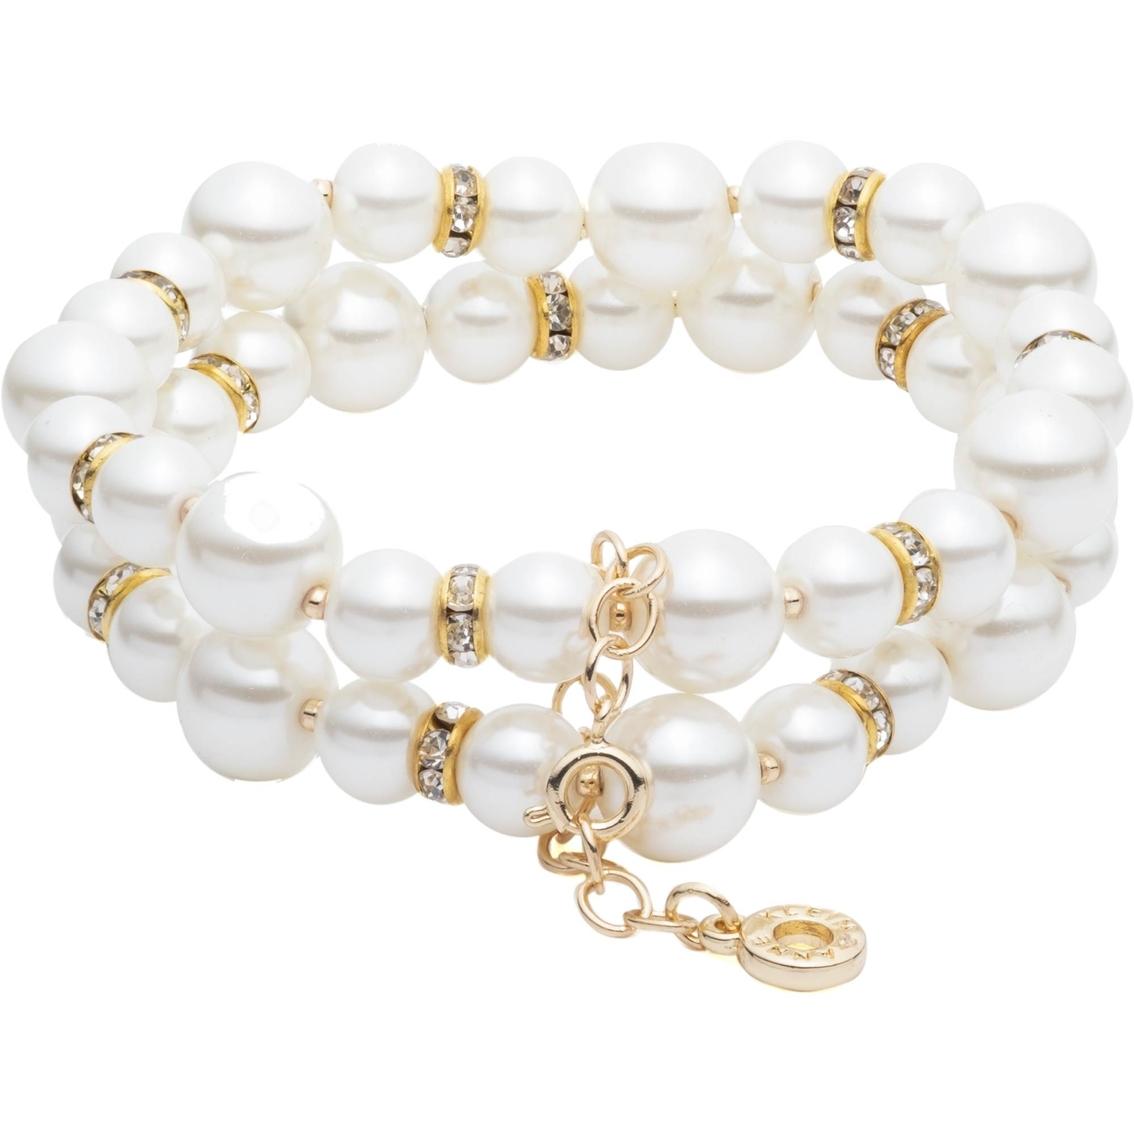 7e3e2019303b4 Anne Klein Goldtone Faux Pearl Crystal Two Row Stretch Bracelet ...